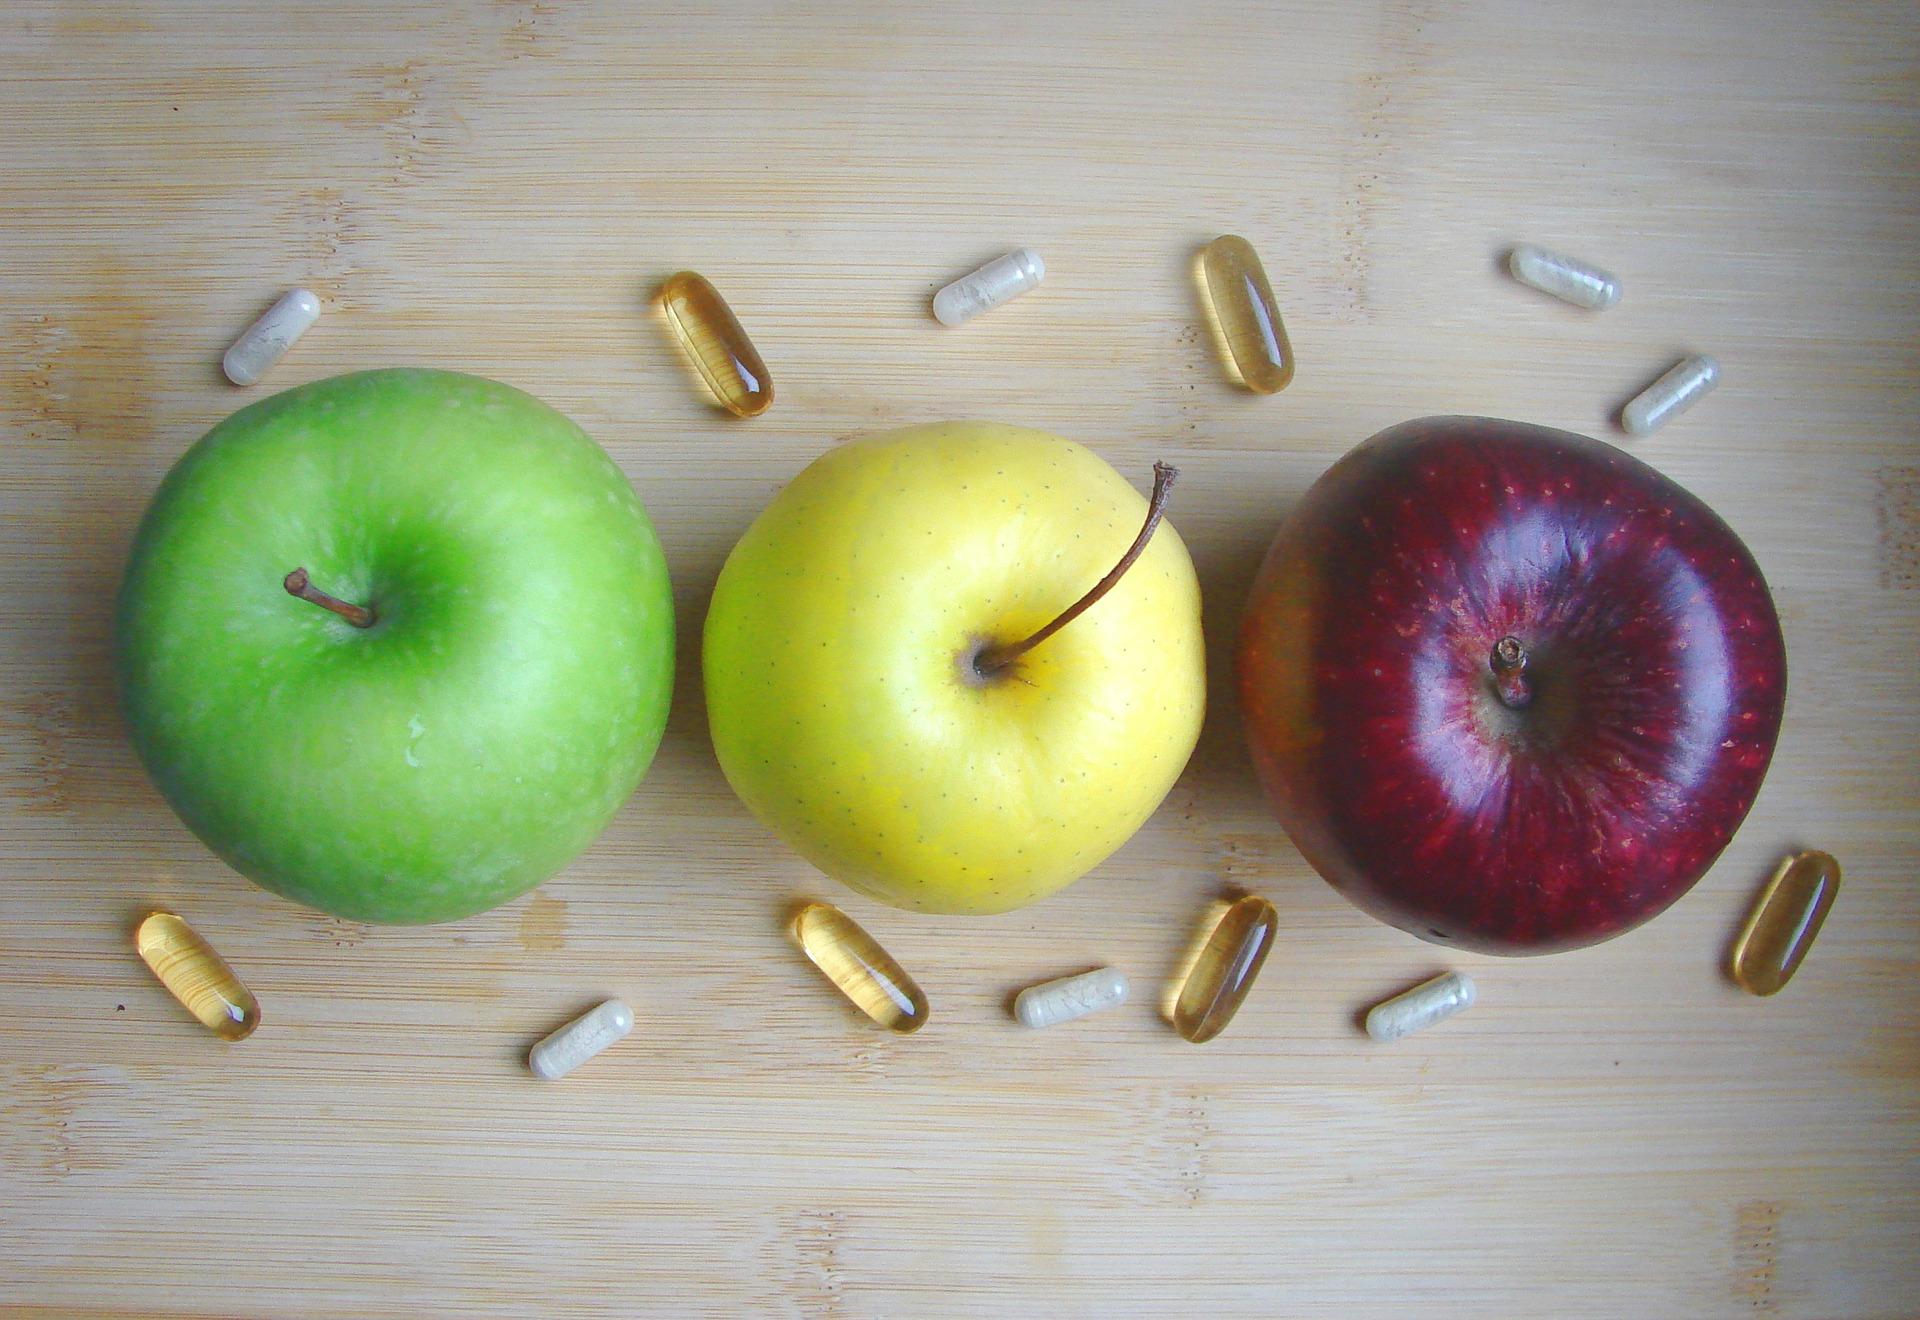 FOOD OR PILLS